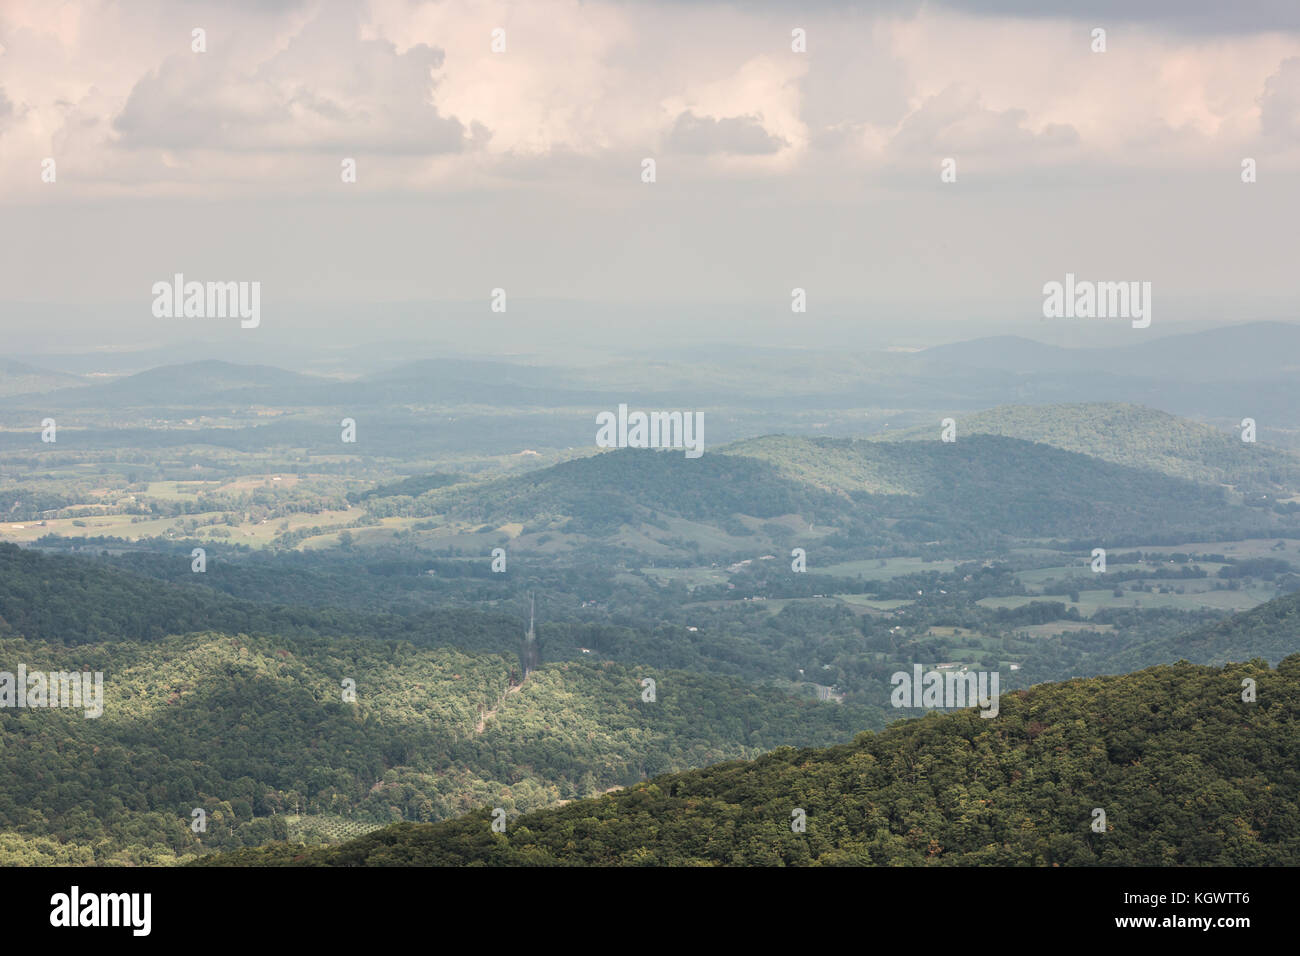 Parc national shennandoah Scenic Drive, usa Banque D'Images